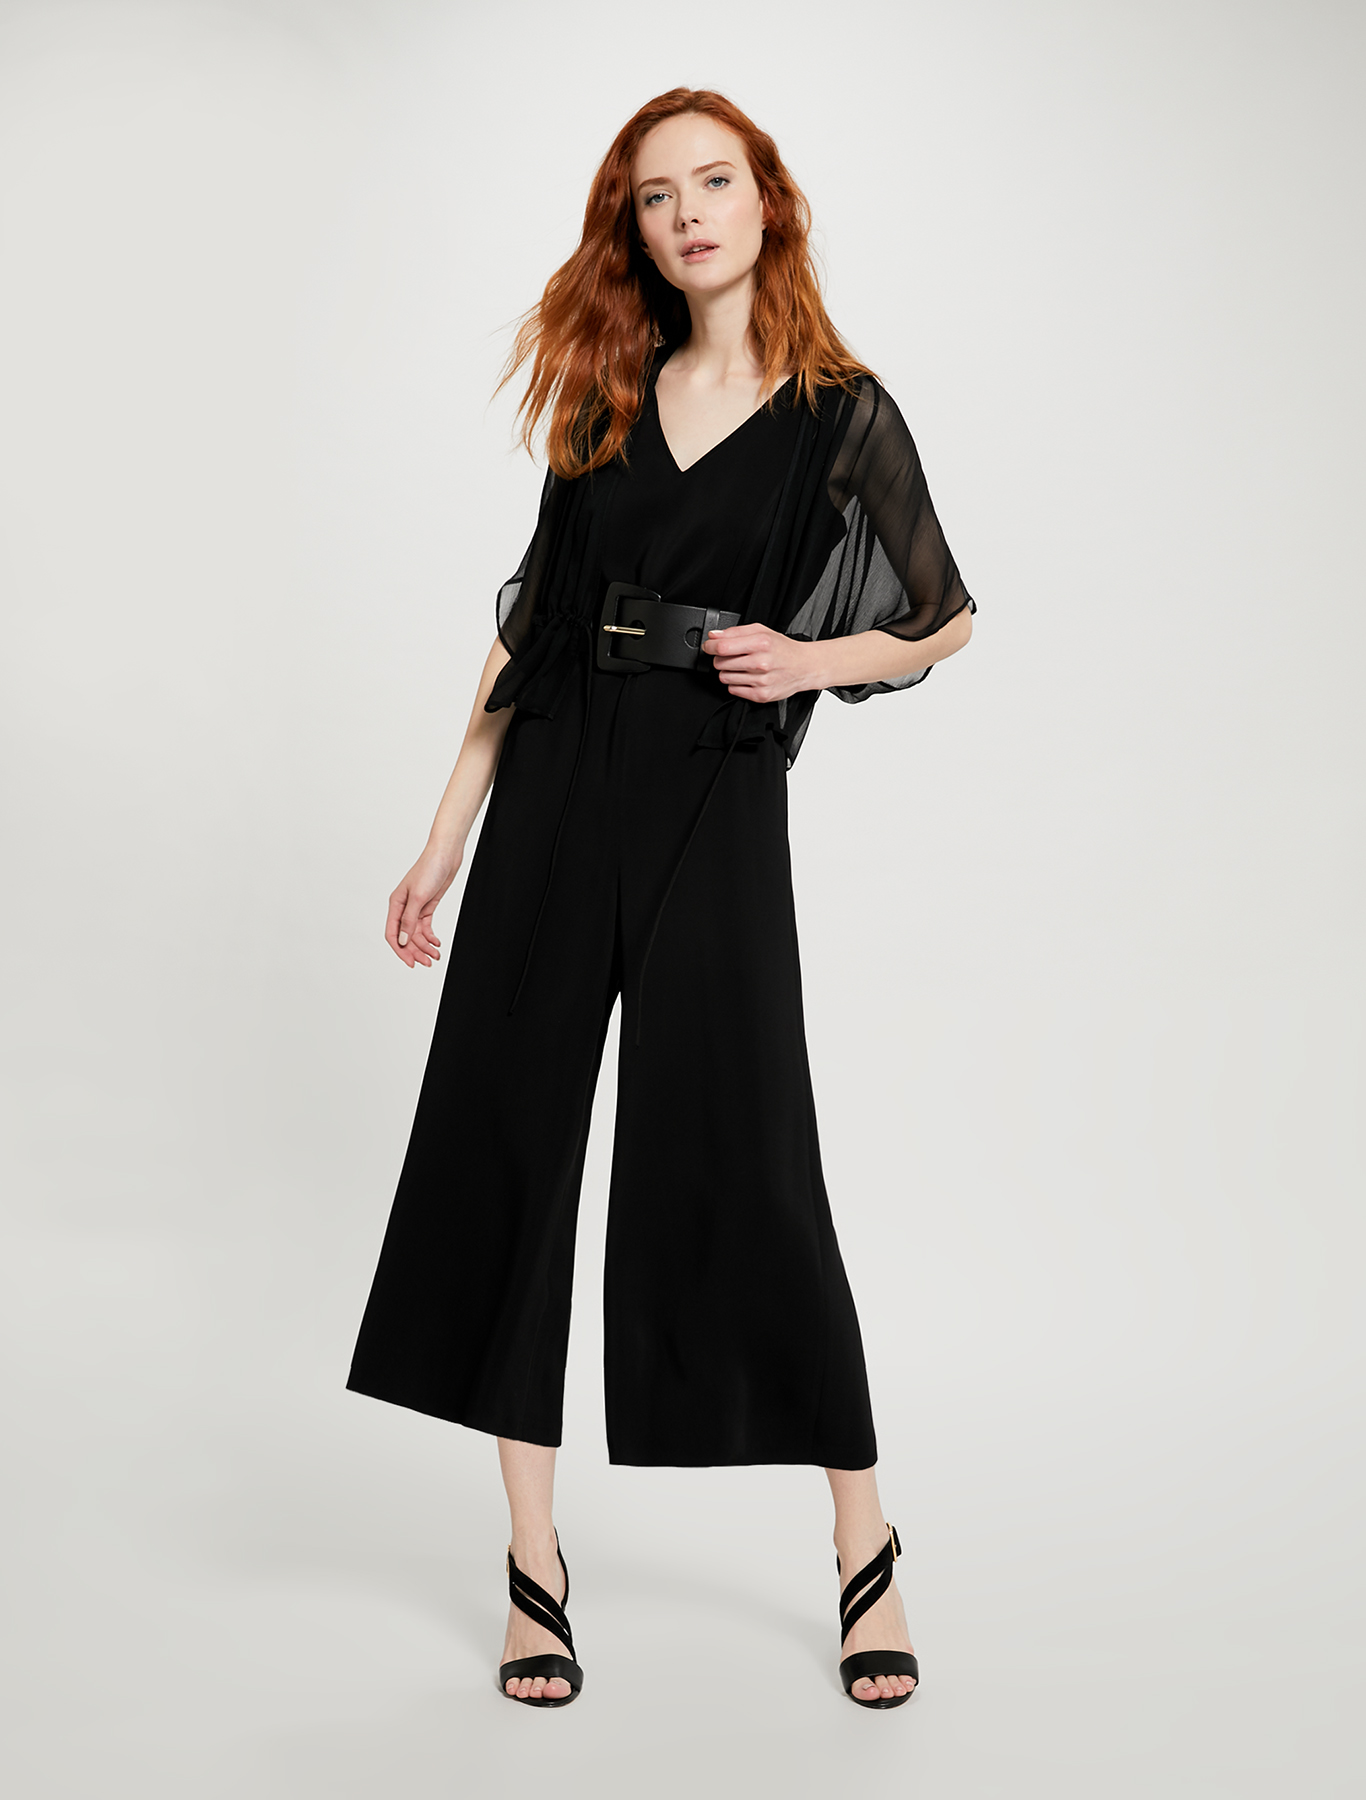 Kimono shrug with drawstring - black - pennyblack